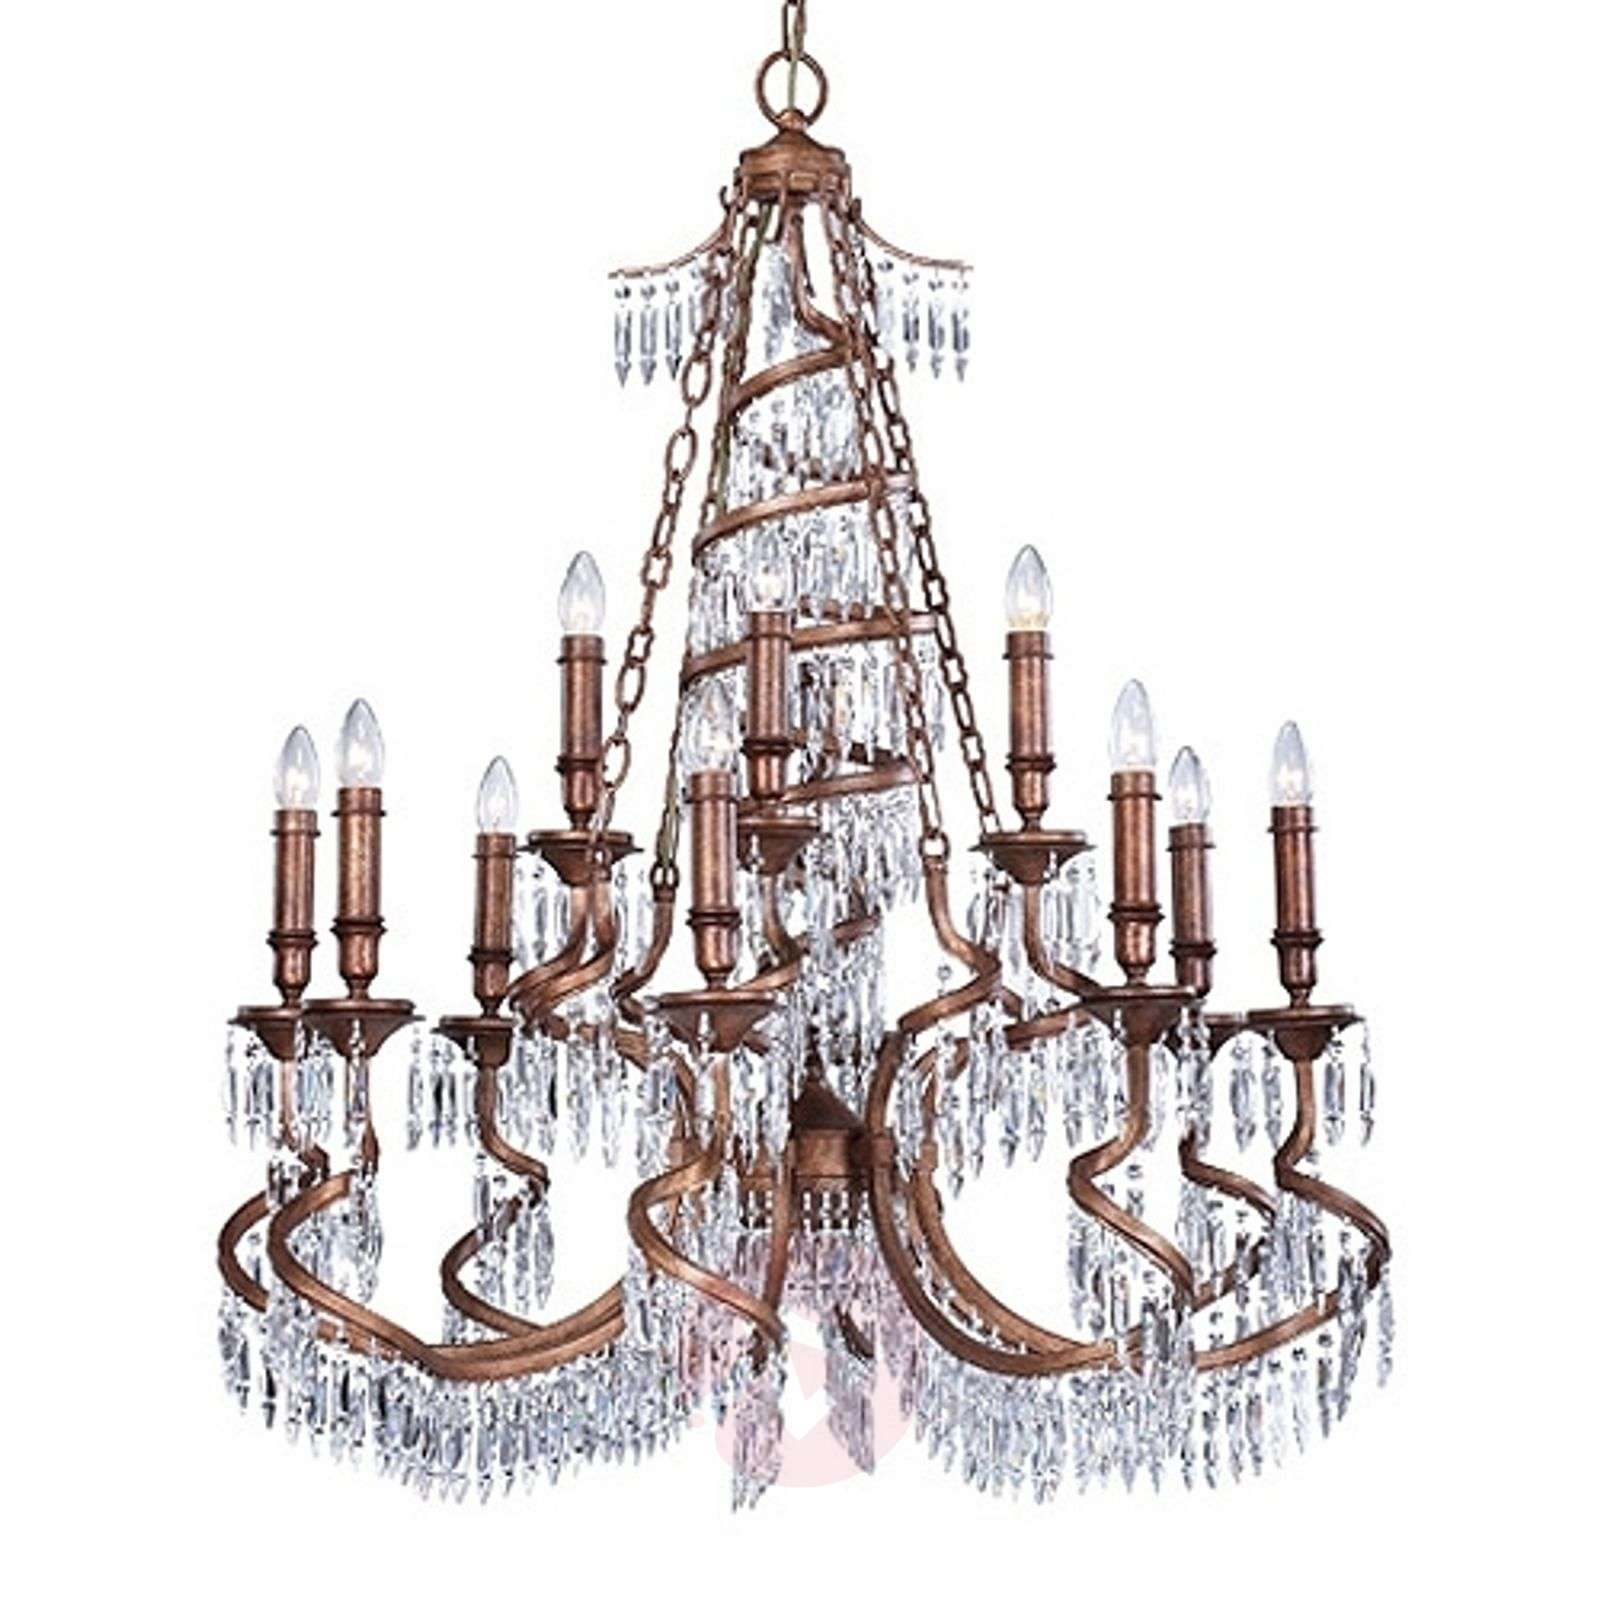 Bronze coloured chandelier twisted lights bronze coloured chandelier twisted 8532207 01 aloadofball Images